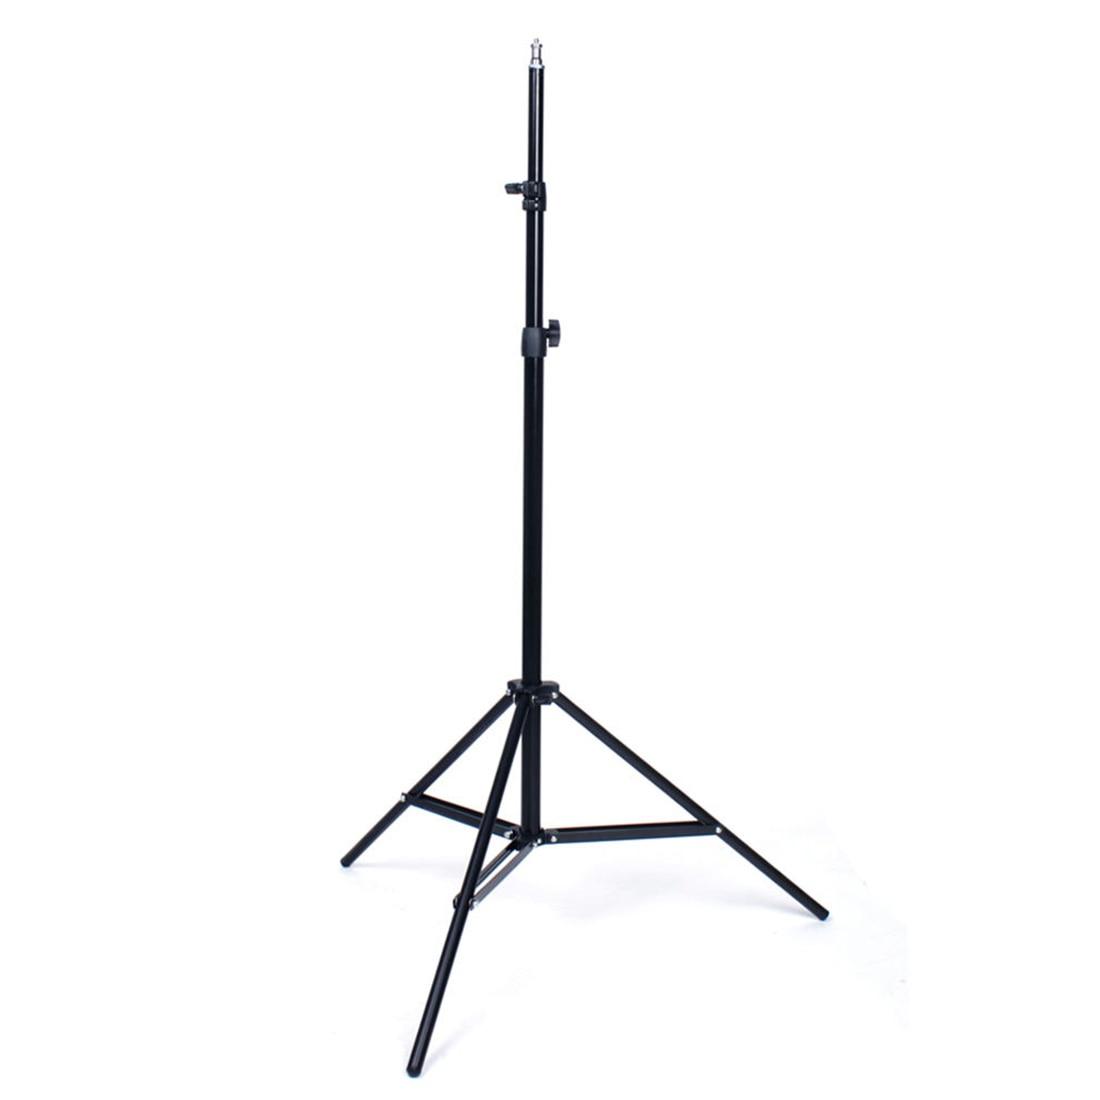 Professional Studio Adjustable Soft Box Flash Continuous Light Stand Tripod